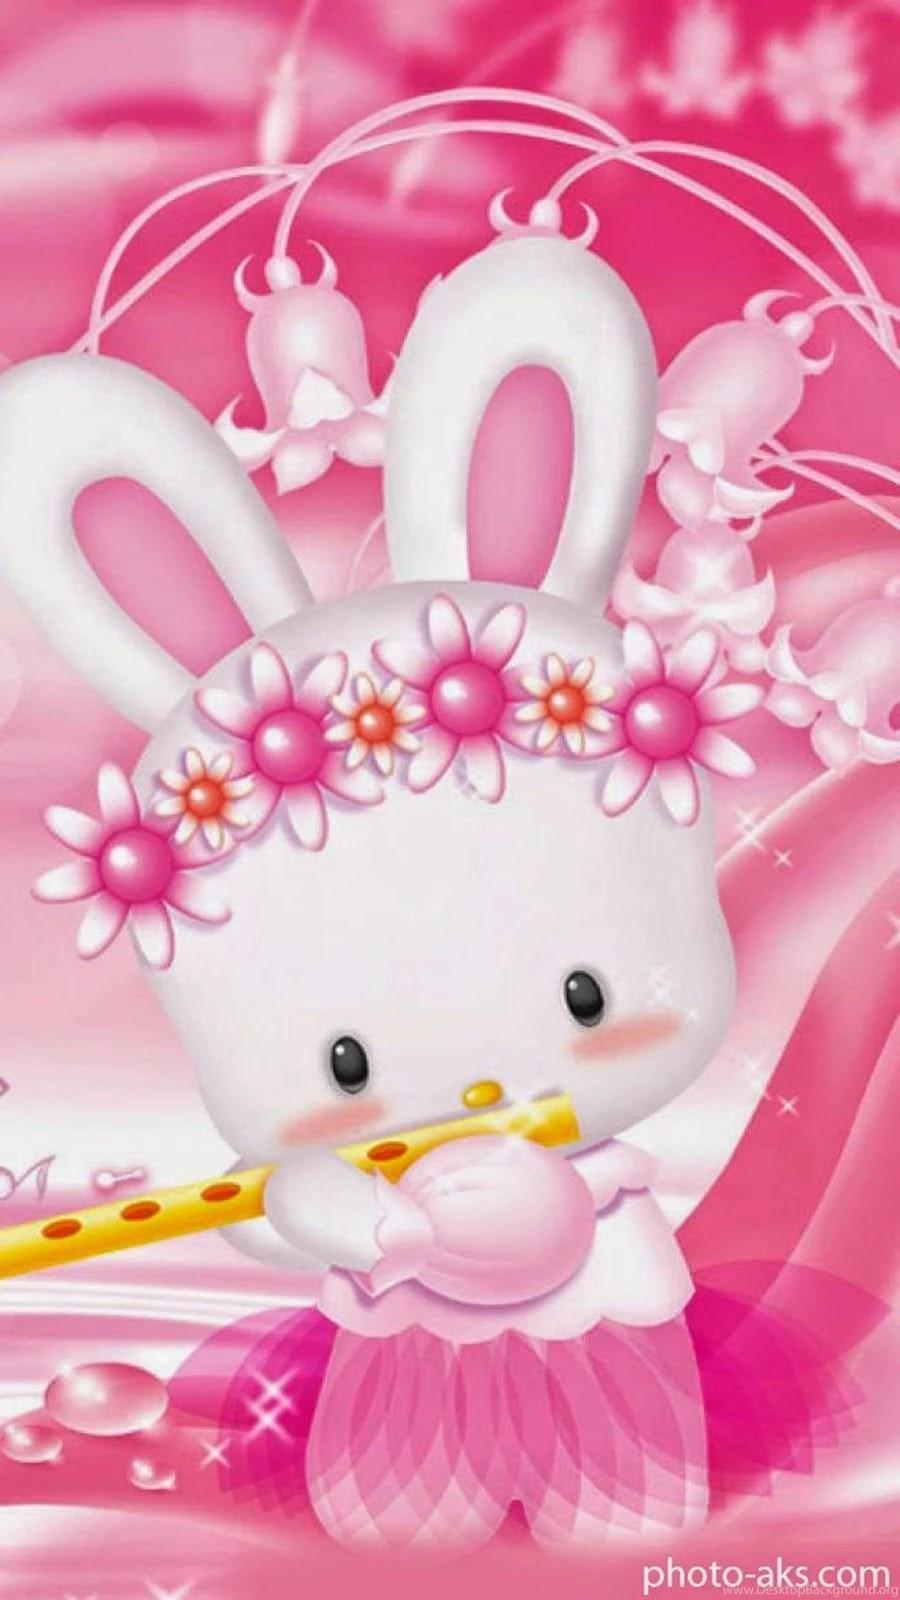 Free Wallpapers Phone Baby Pink On Iphone 6 Plus Desktop